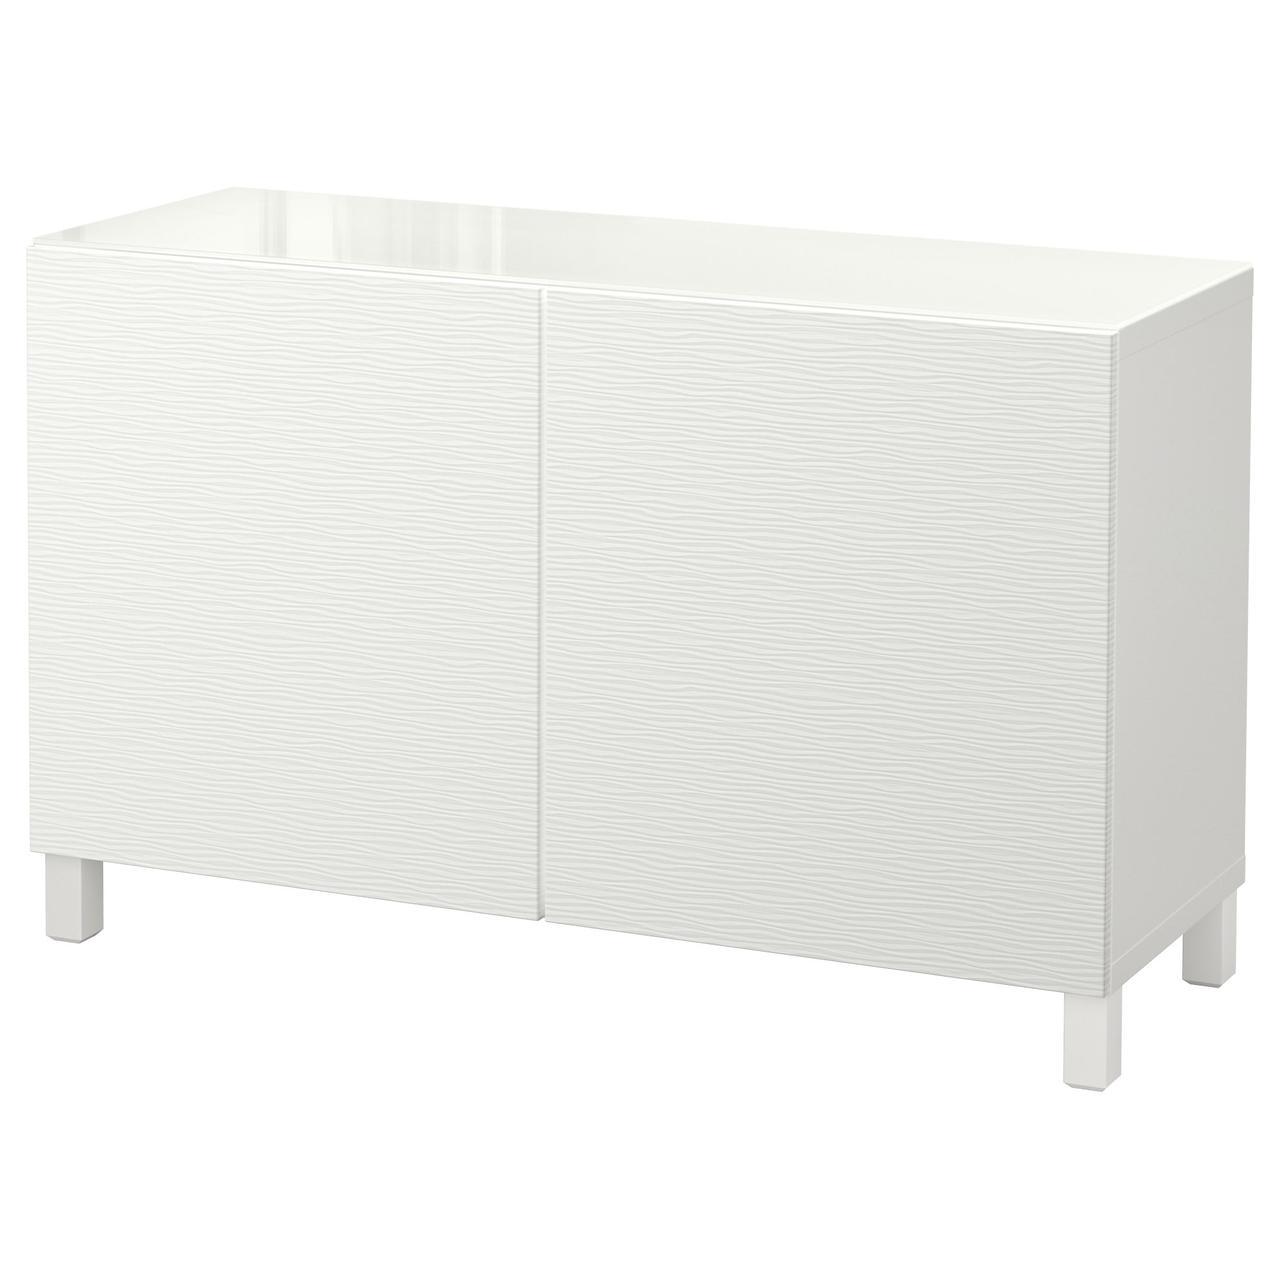 Тумба IKEA BESTÅ 120x40x74 см Laxviken белая 892.101.65